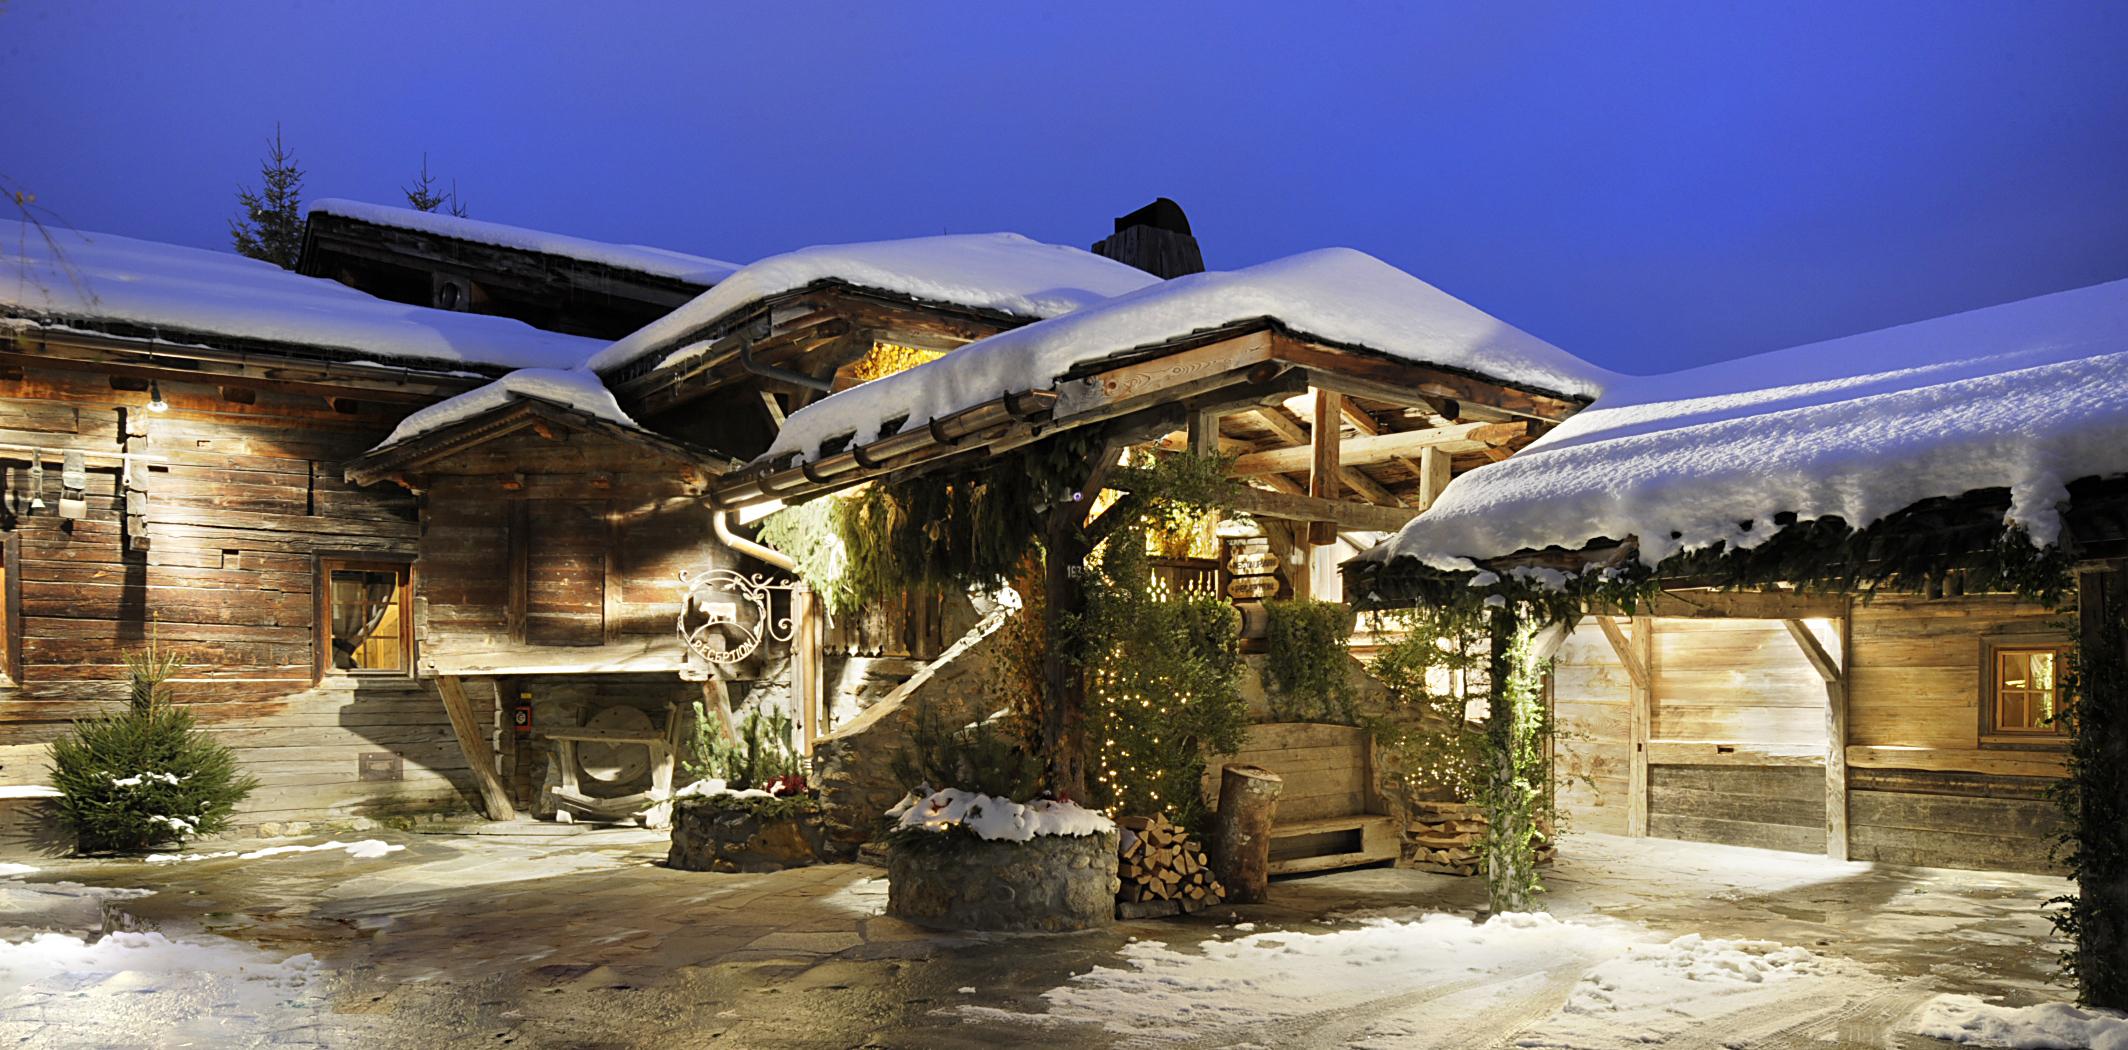 ext_hiver_nuit